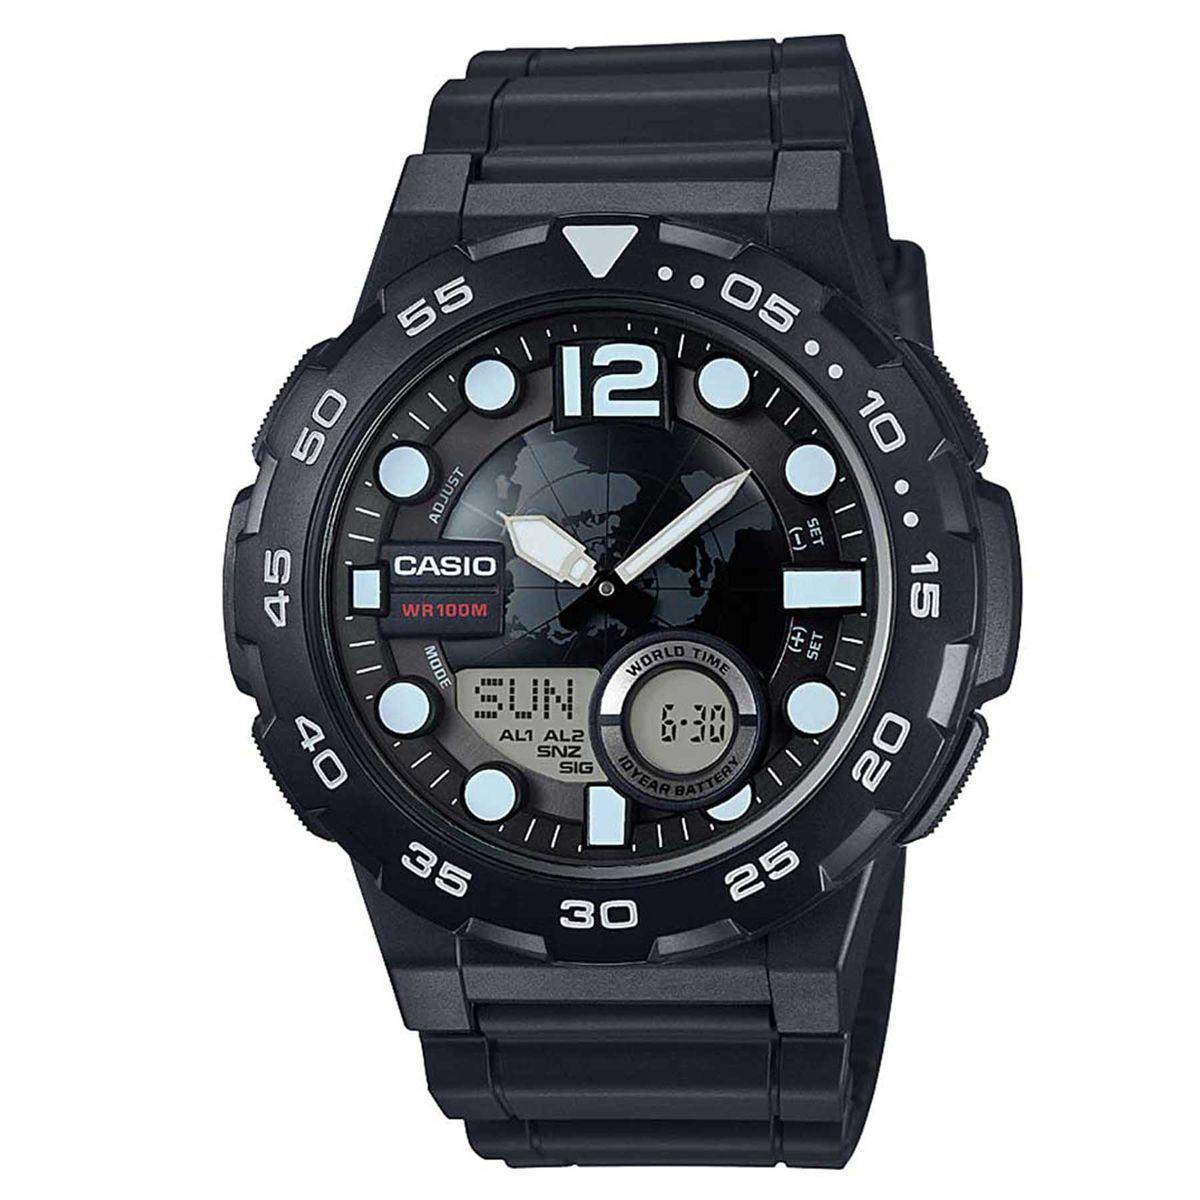 354b36bd6cc Relógio Casio Standard Digital Masculino AEQ-100W-1A - Relógio ...